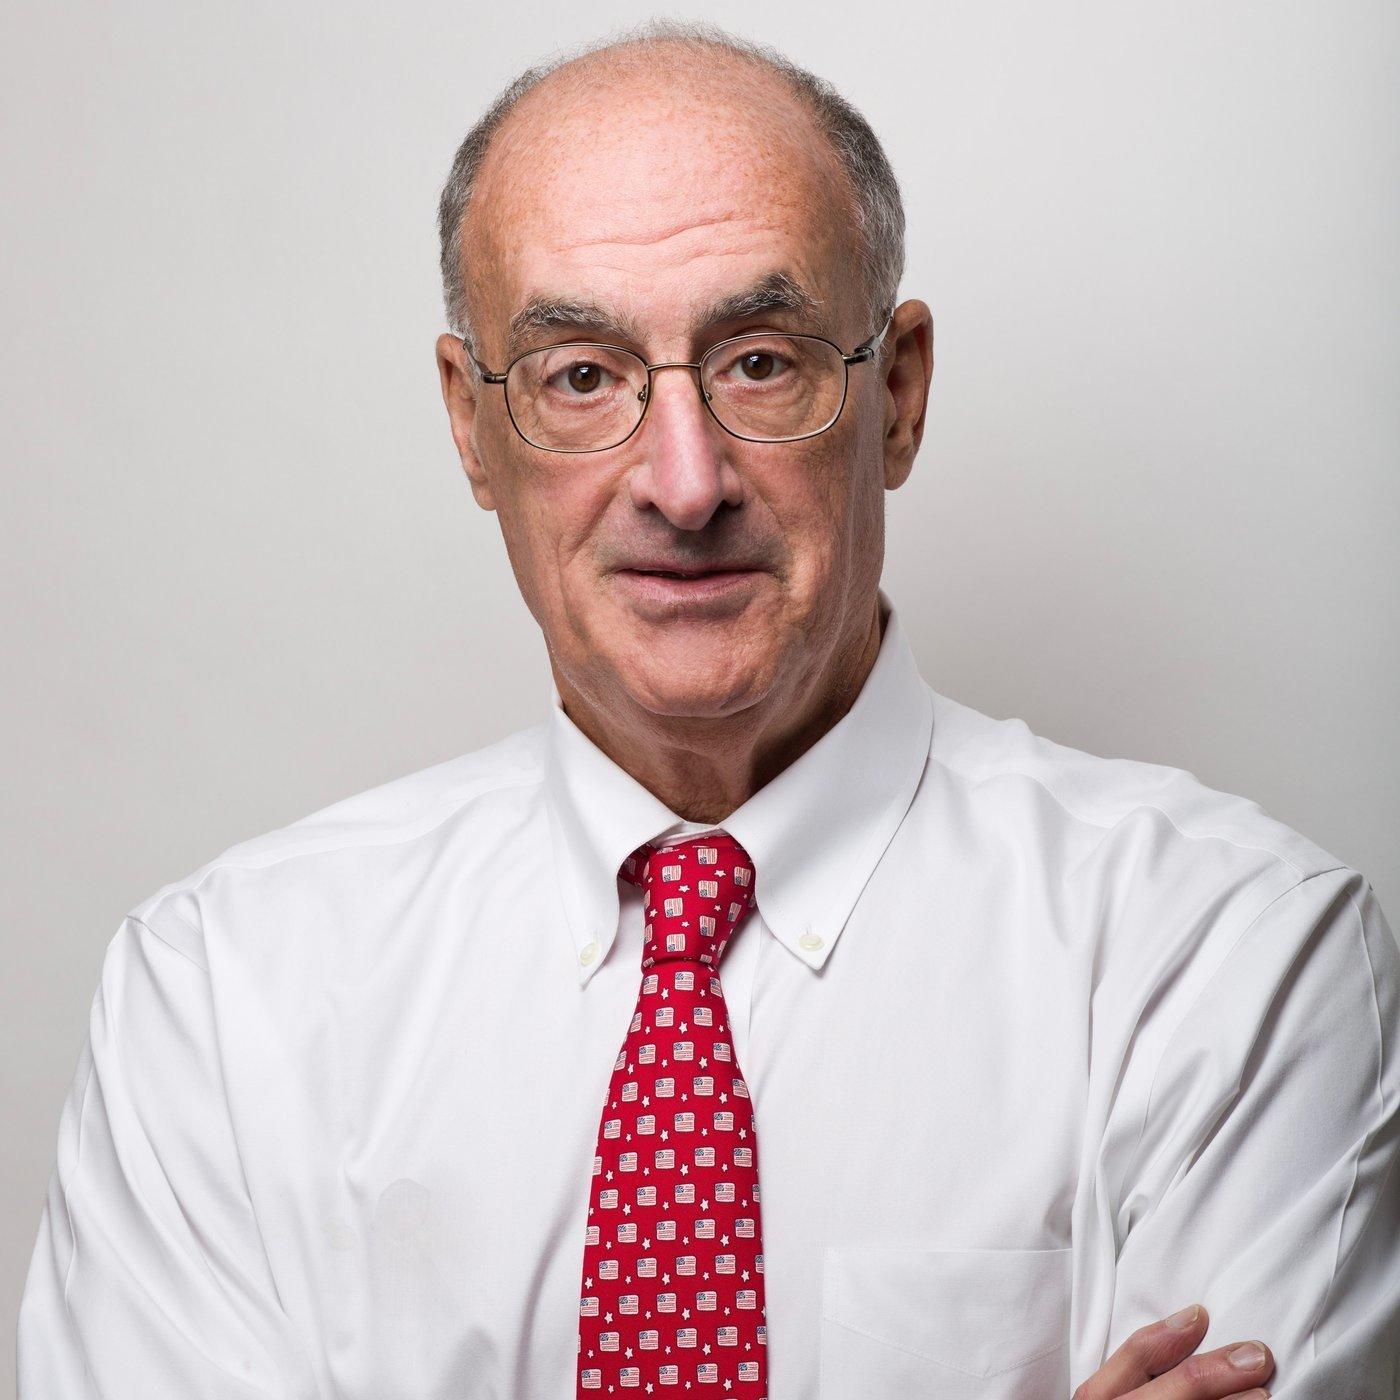 Howard Anderson: The Entrepreneur